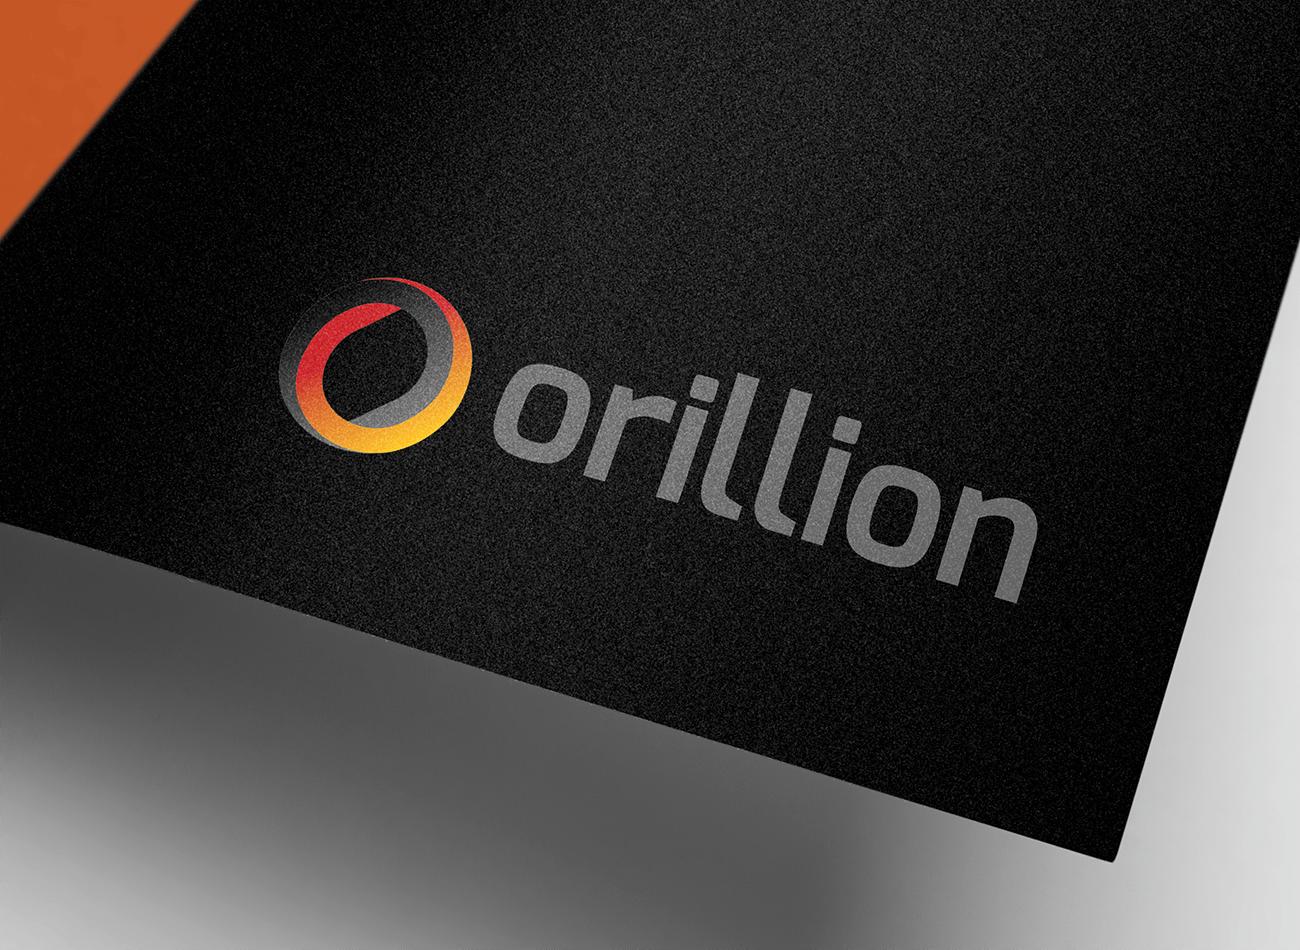 orillion-corporate-logo-designers-agent-orange-johannesburg-experienced-branding-company.png